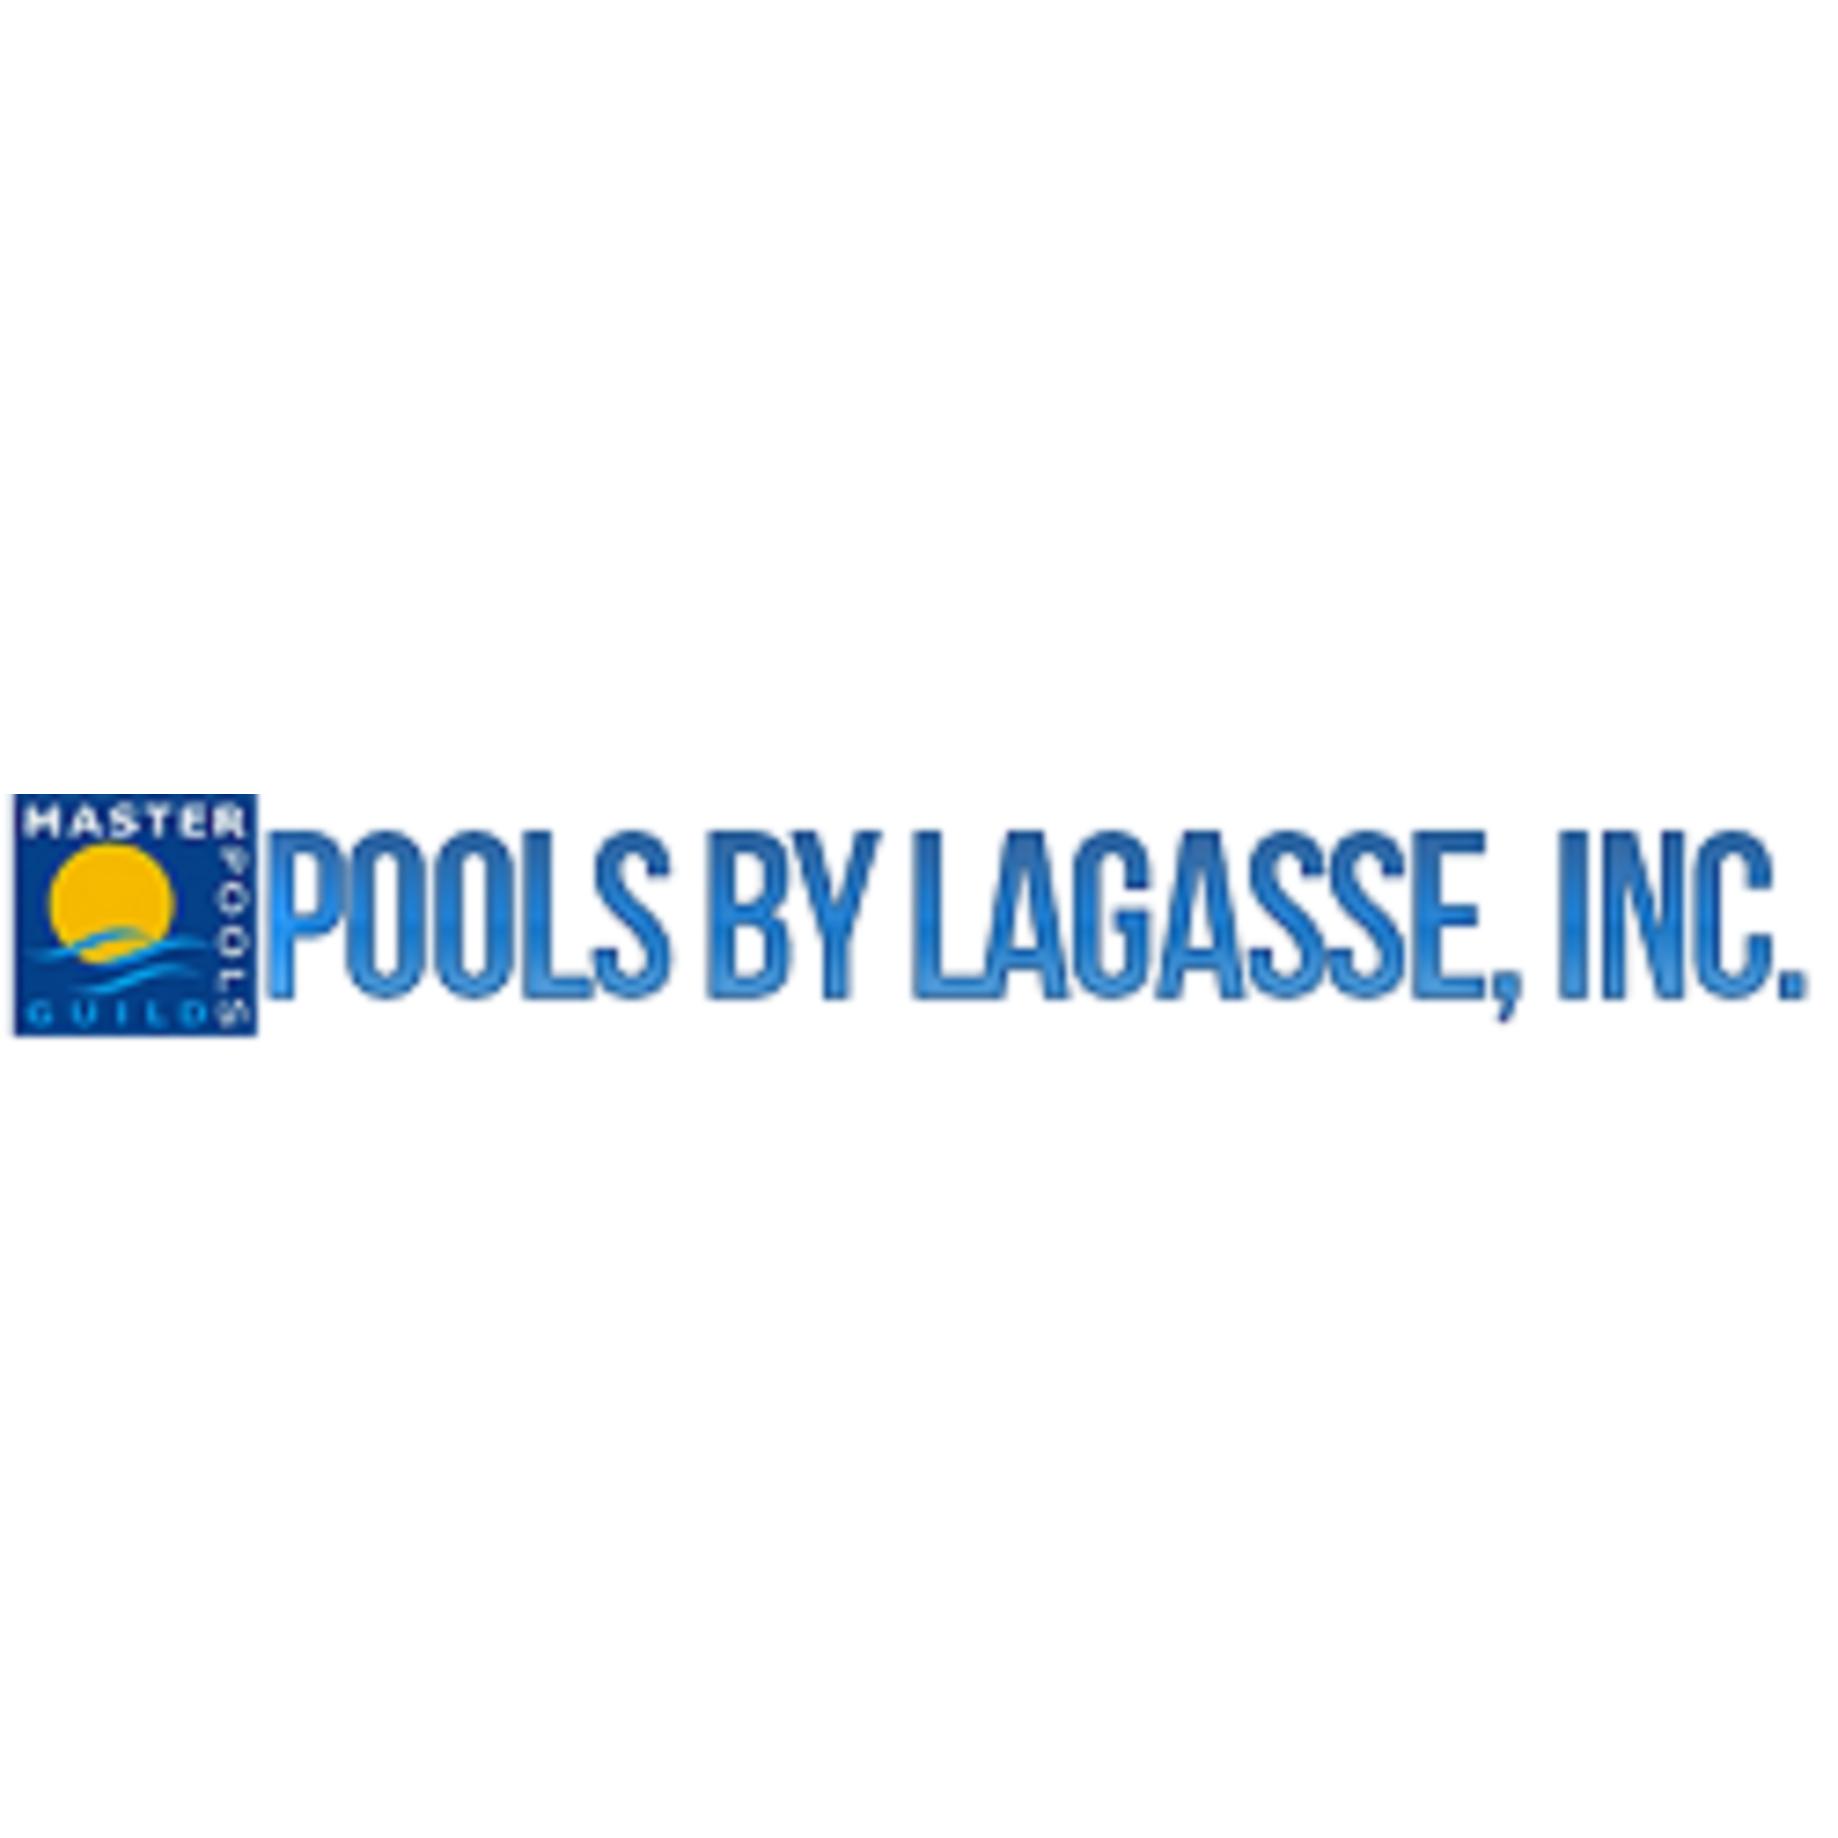 Pools By Lagasse Inc - Sarasota, FL - Swimming Pools & Spas